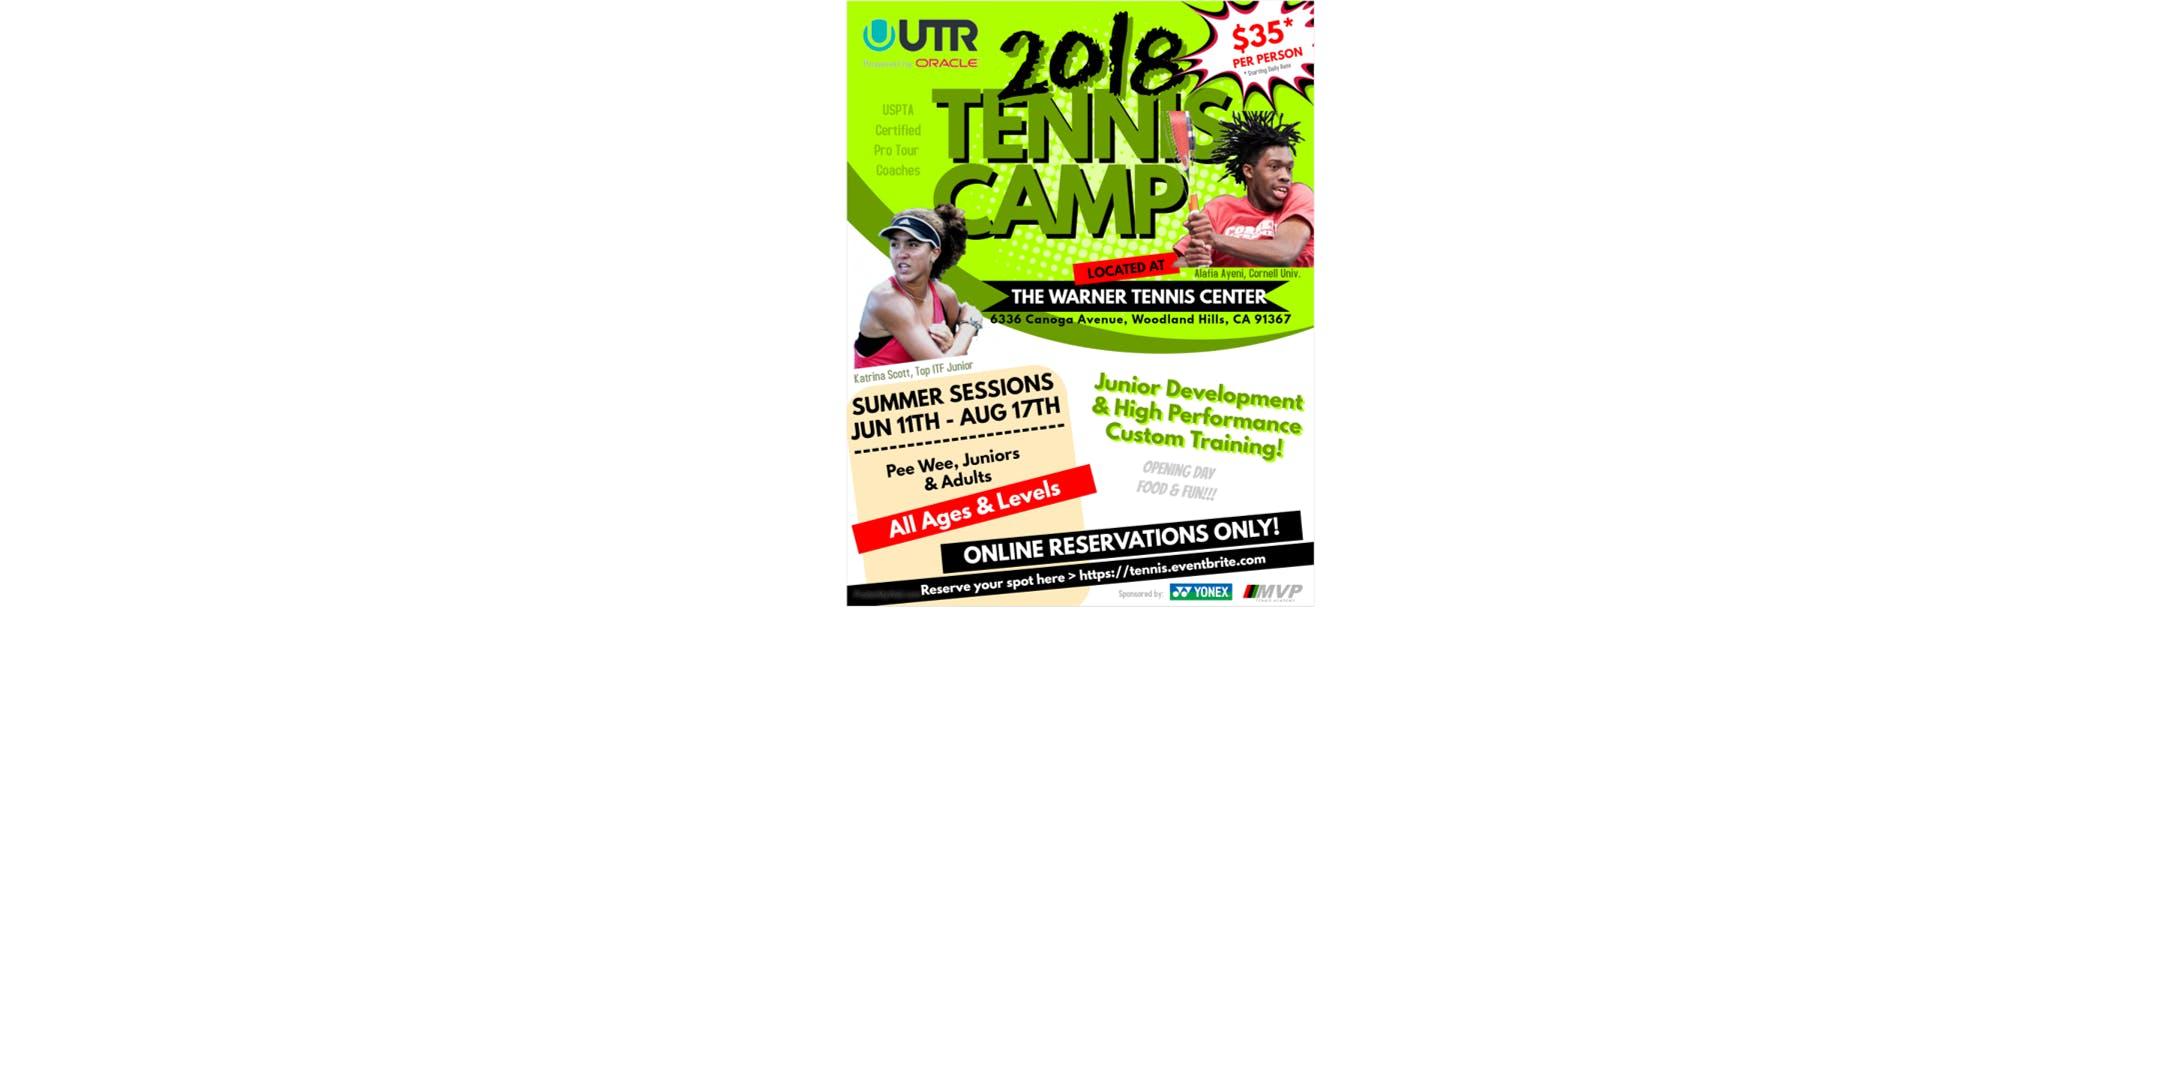 Tennis Summer Camp by Yonex | High Performanc